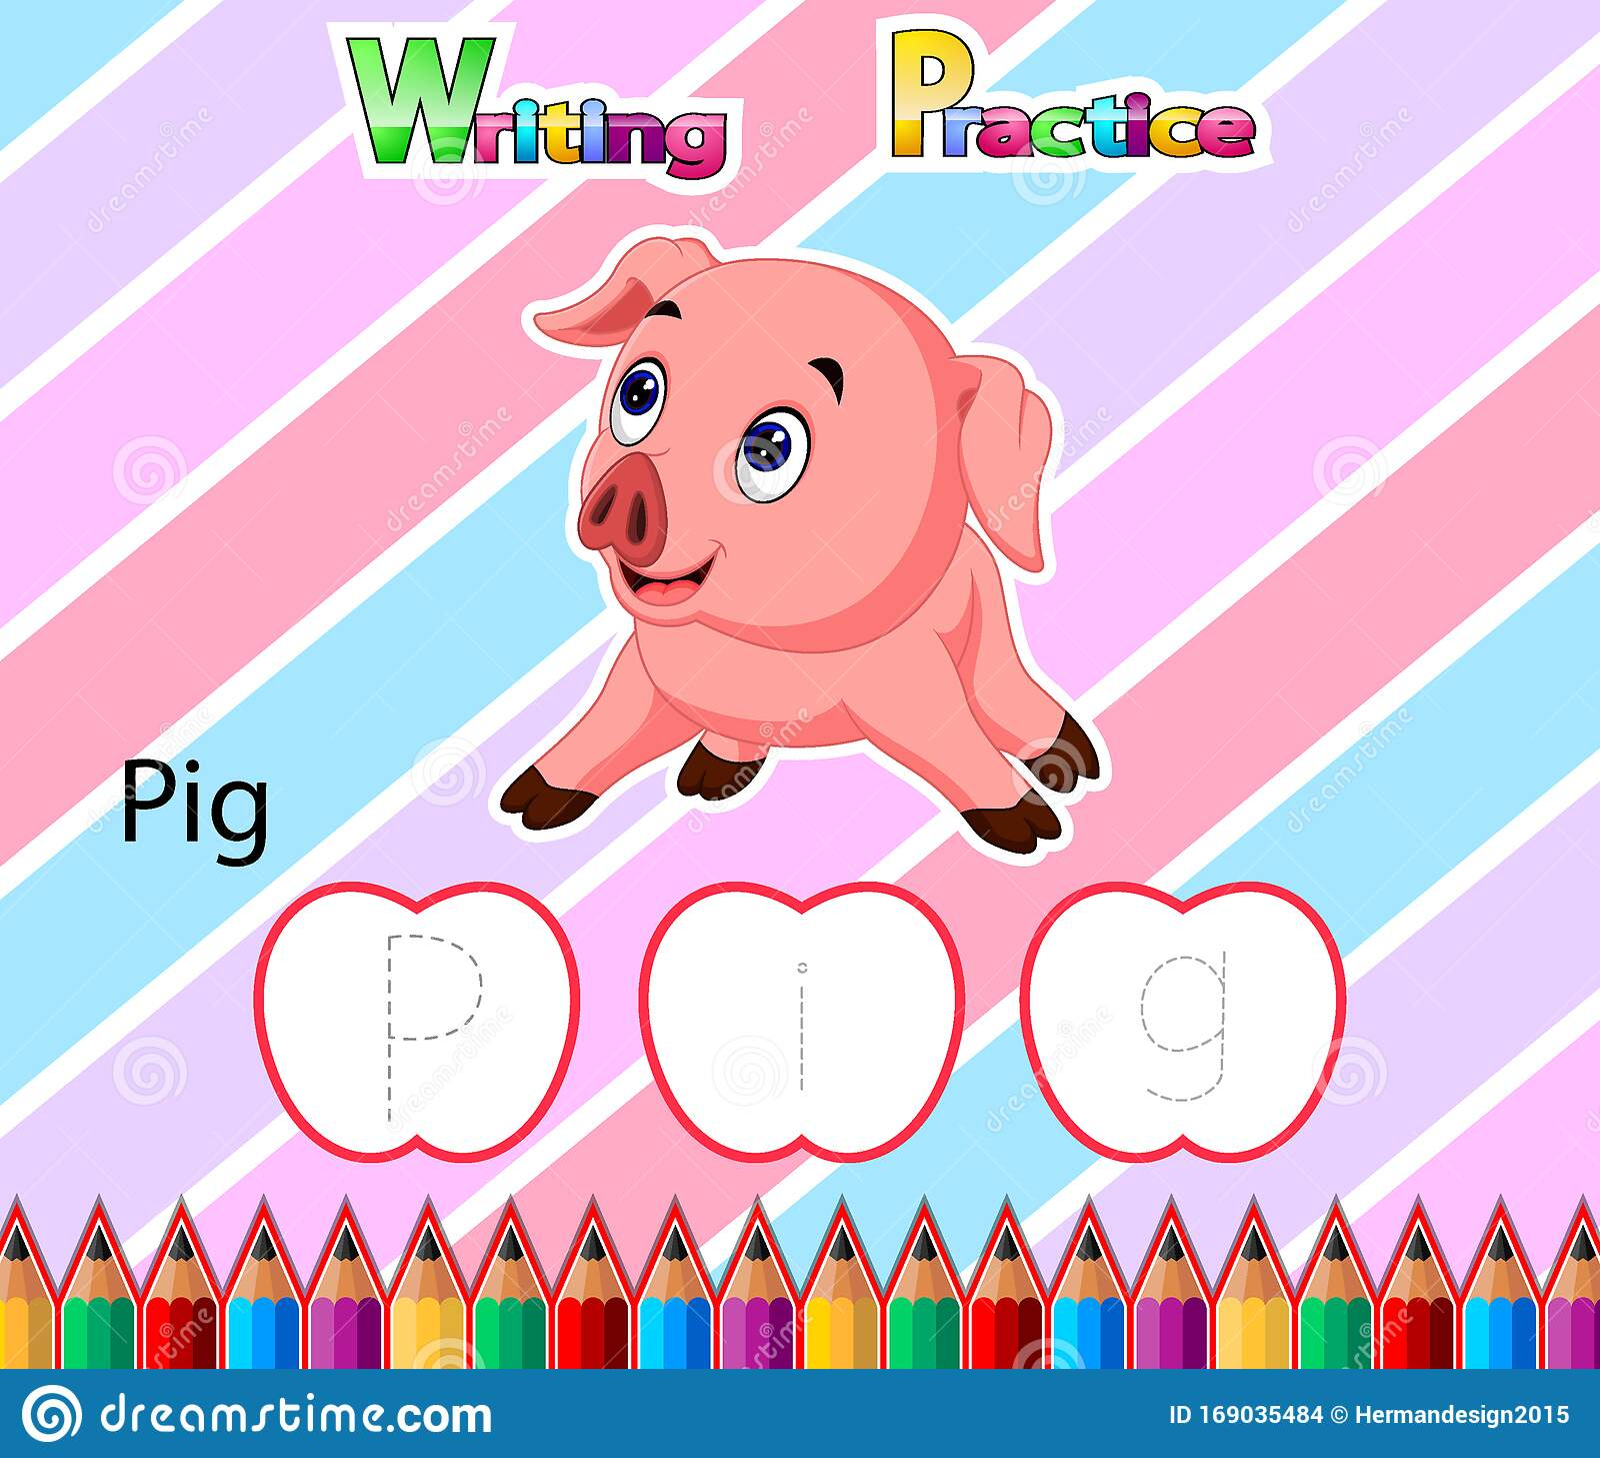 Worksheet Writing Practice Alphabet P For Pig Stock Vector